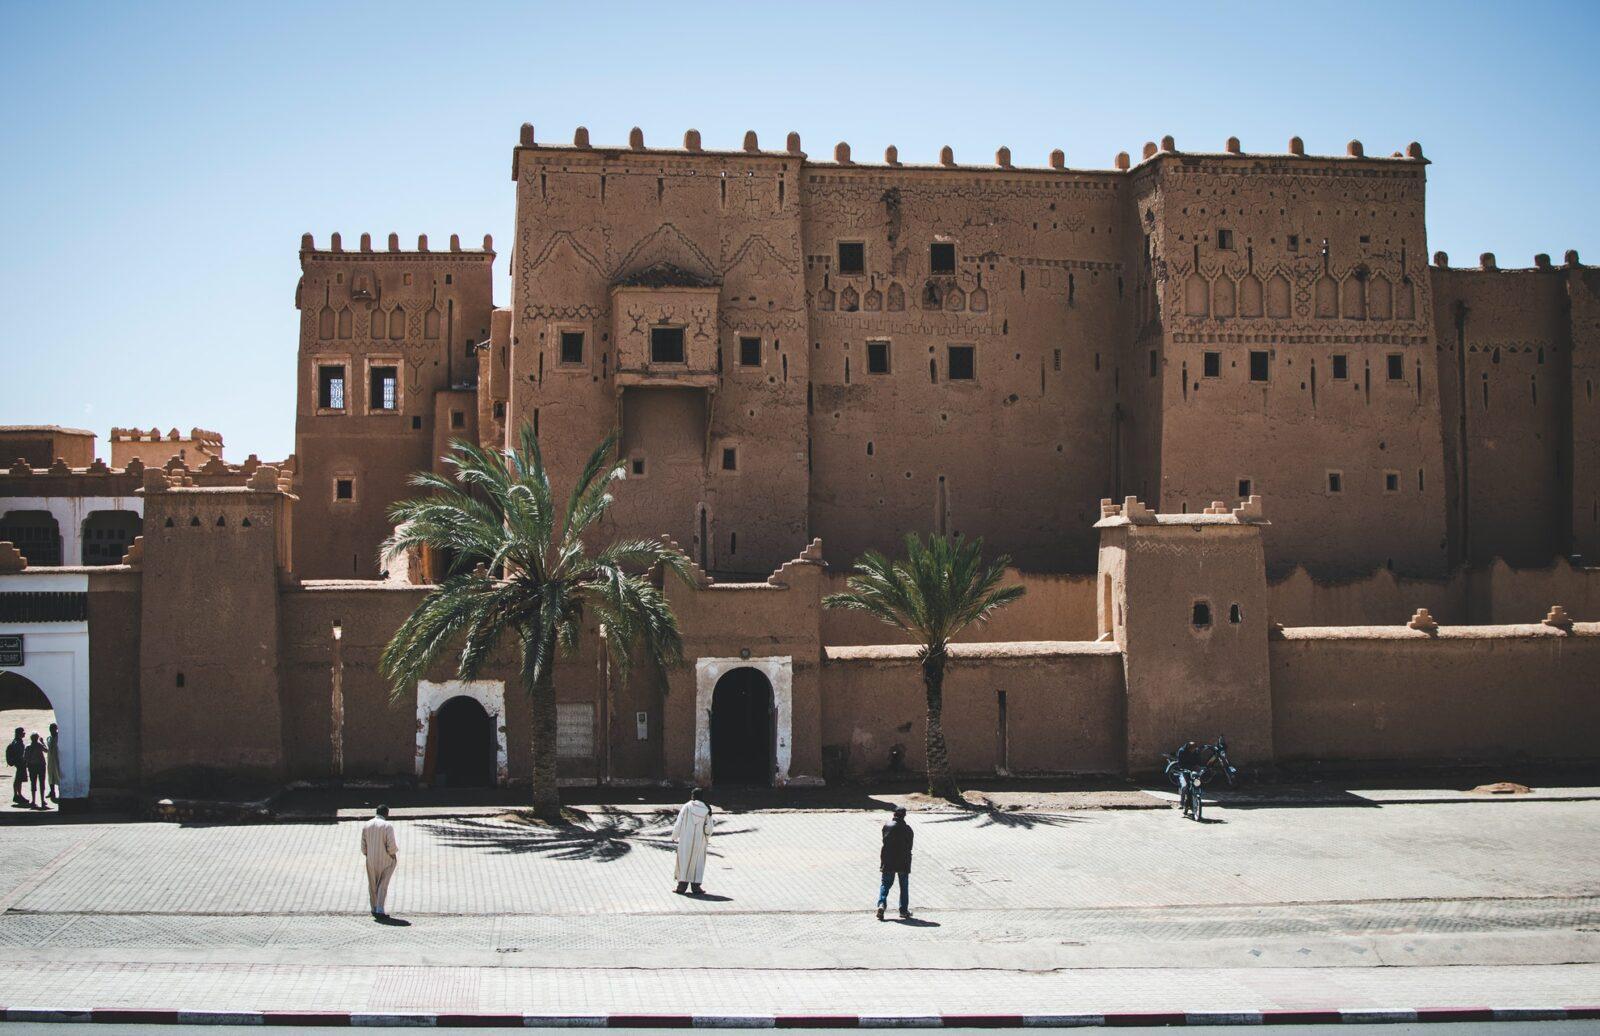 pexels nicolas postiglioni 943510 - Guide Morocco Tours